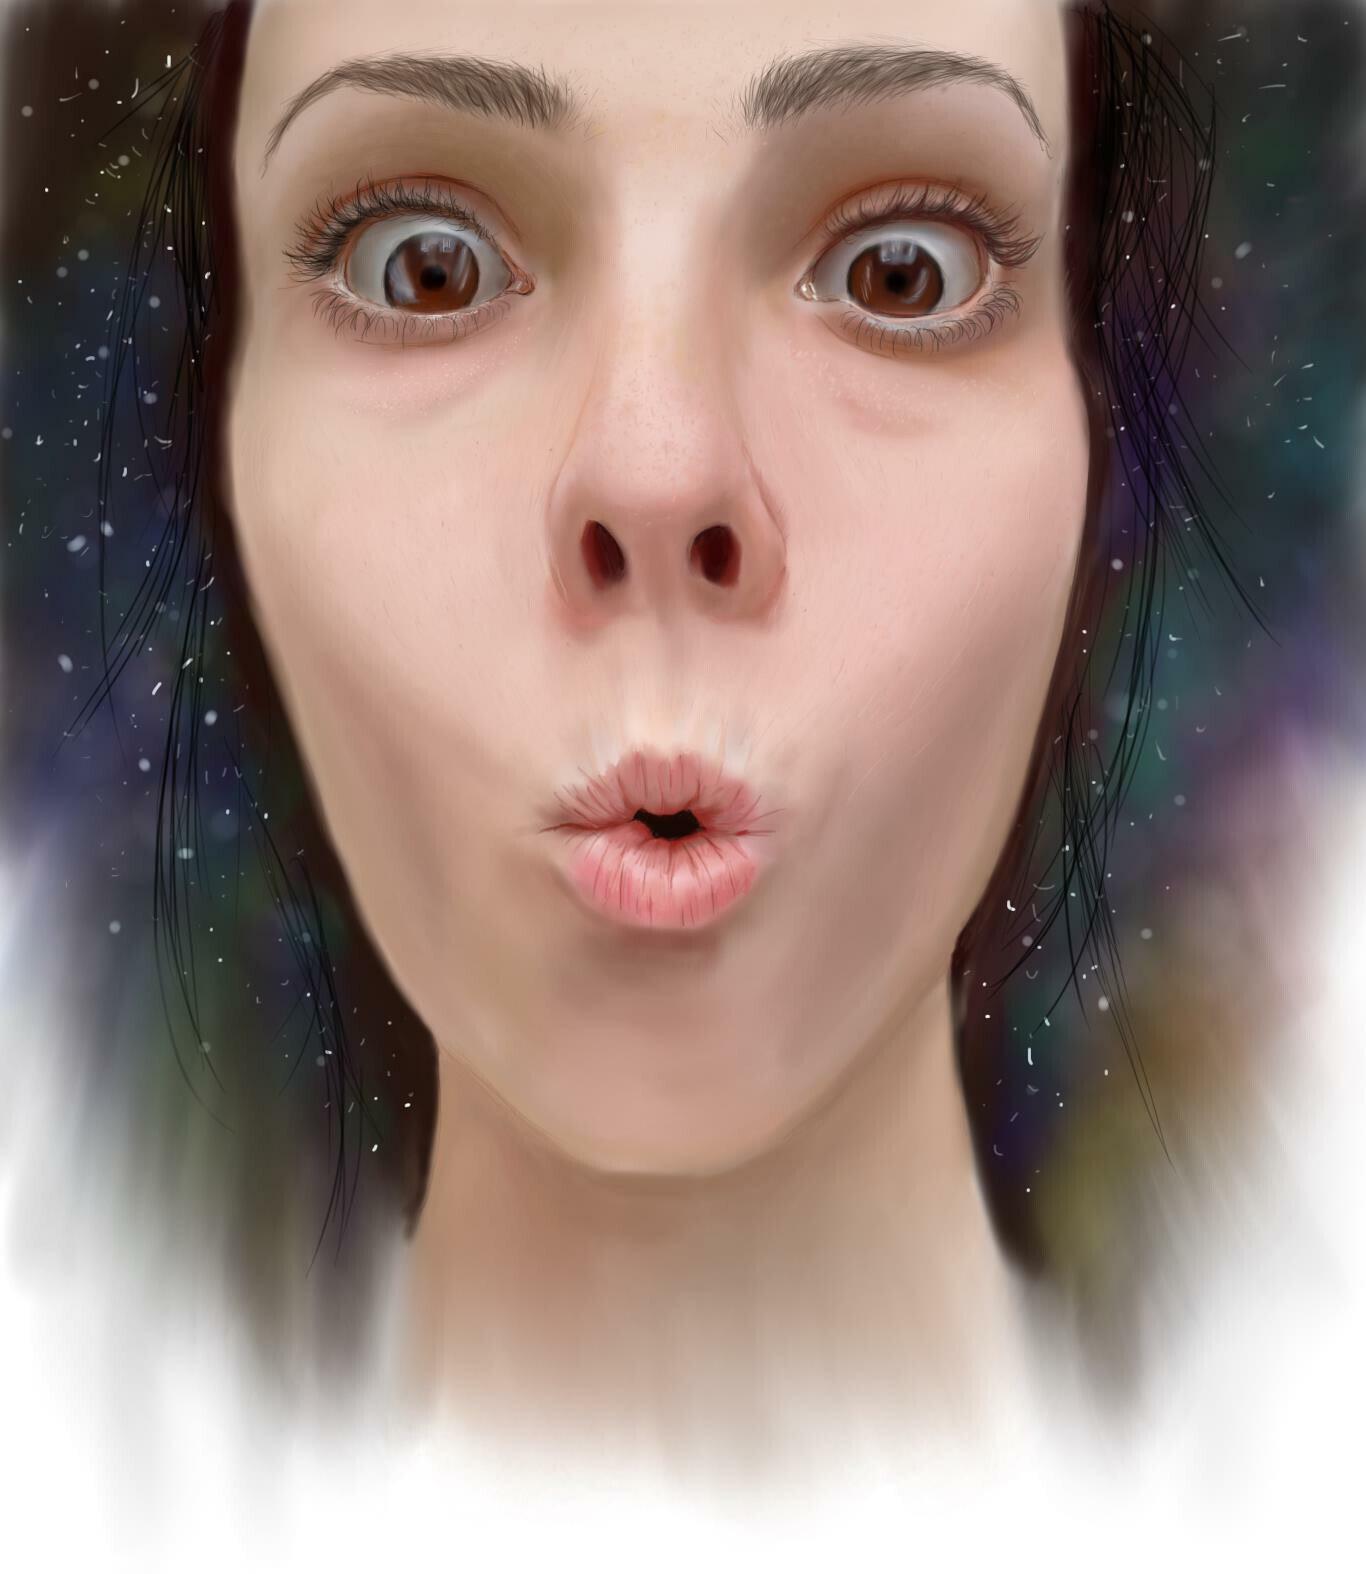 Cosmic Self-Portrait